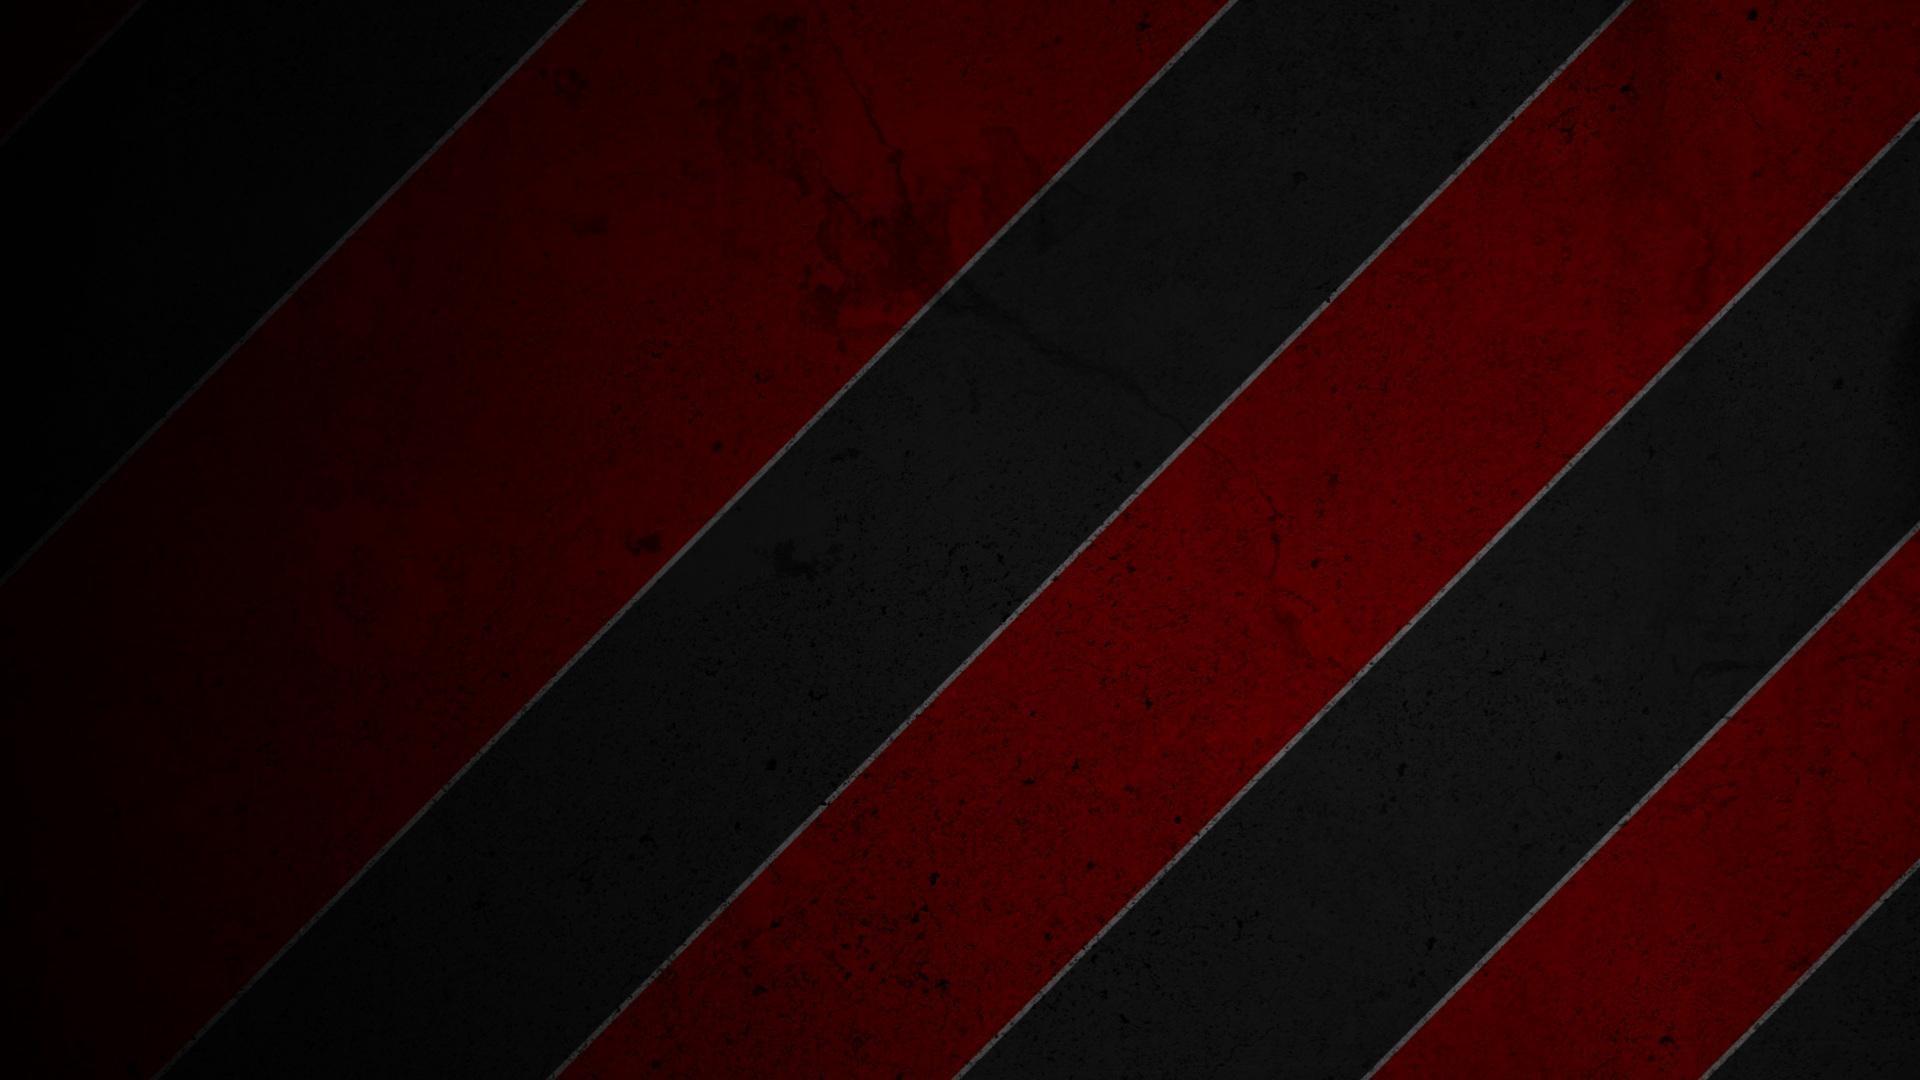 Red-Black-Photos-Widescreen-d-1920×1080-px-KB-